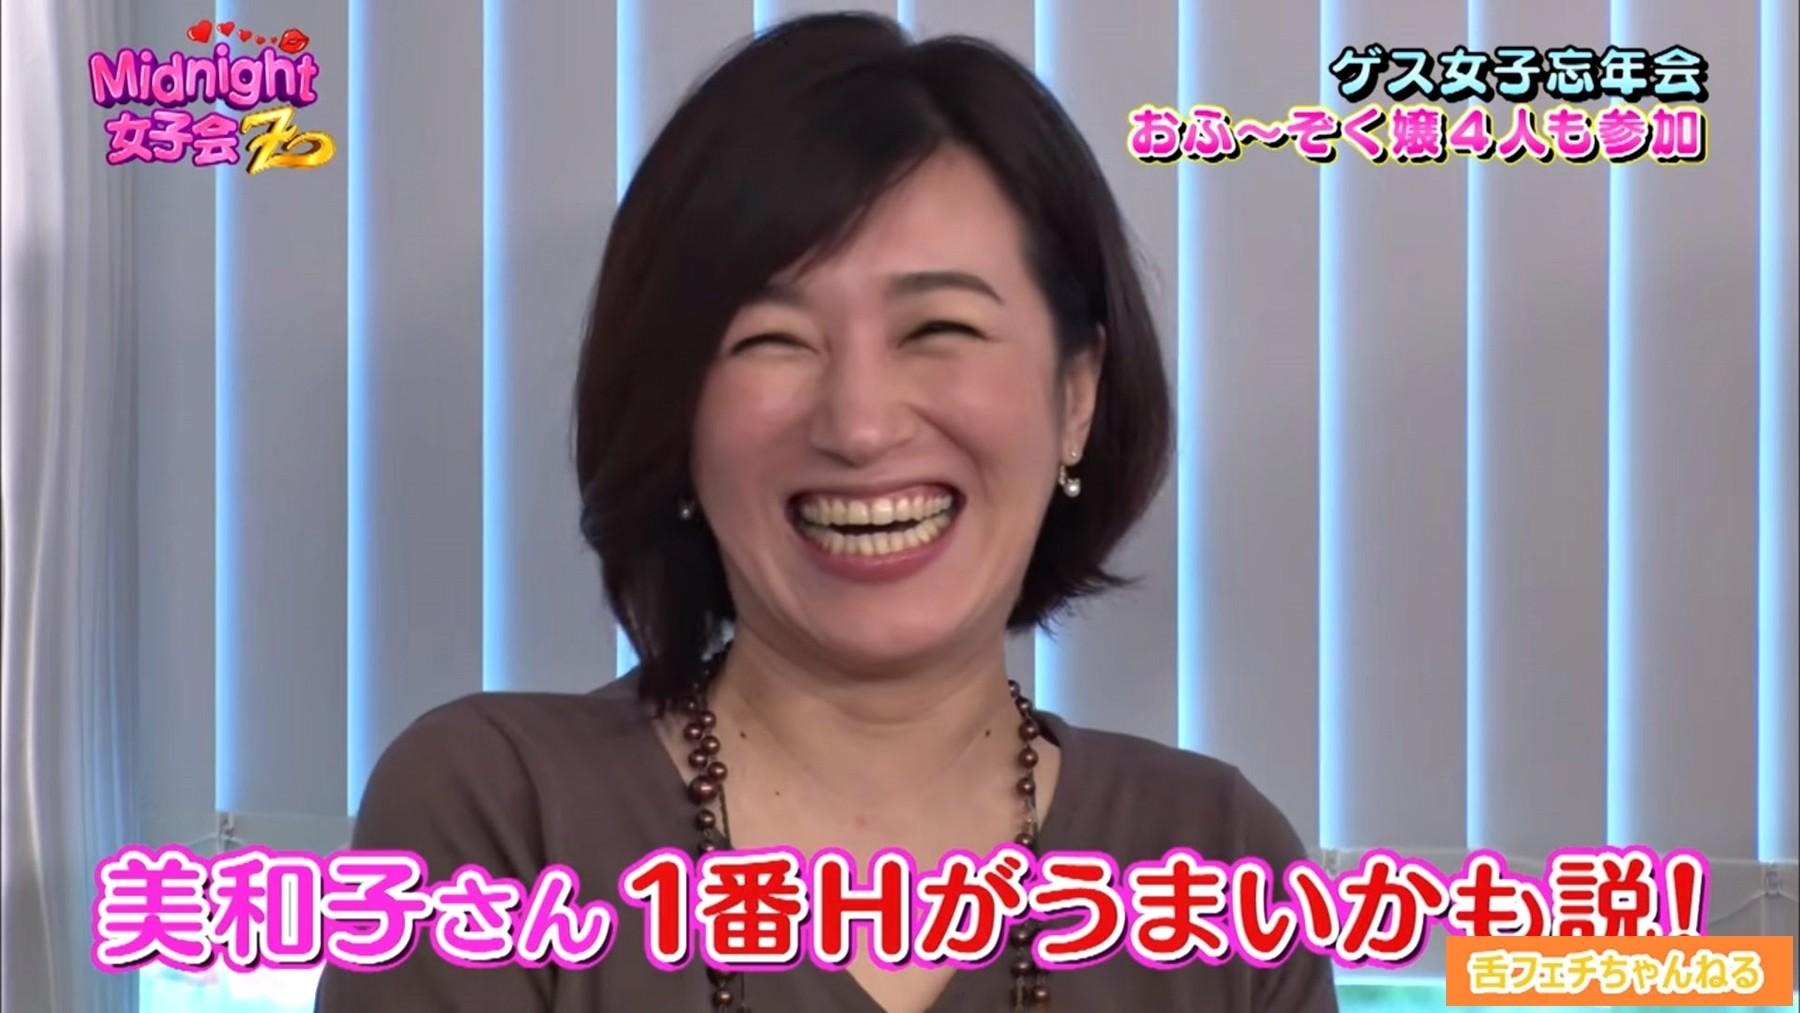 Midnight女子会 イラマチオ選手権 (43)